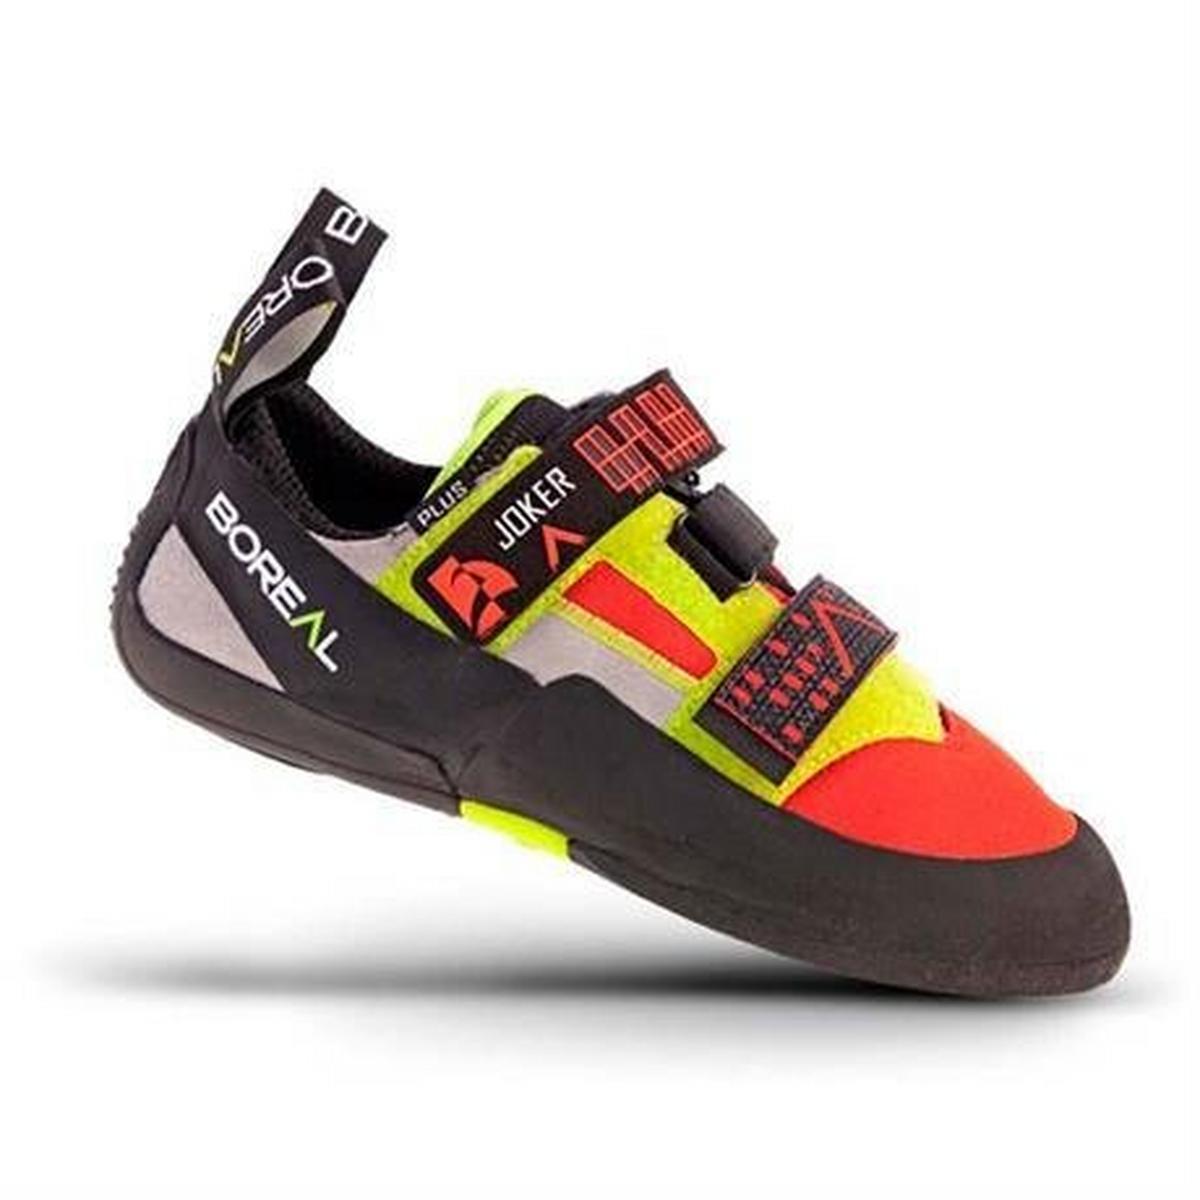 Boreal Rock Shoes Men's Joker Plus Velcro